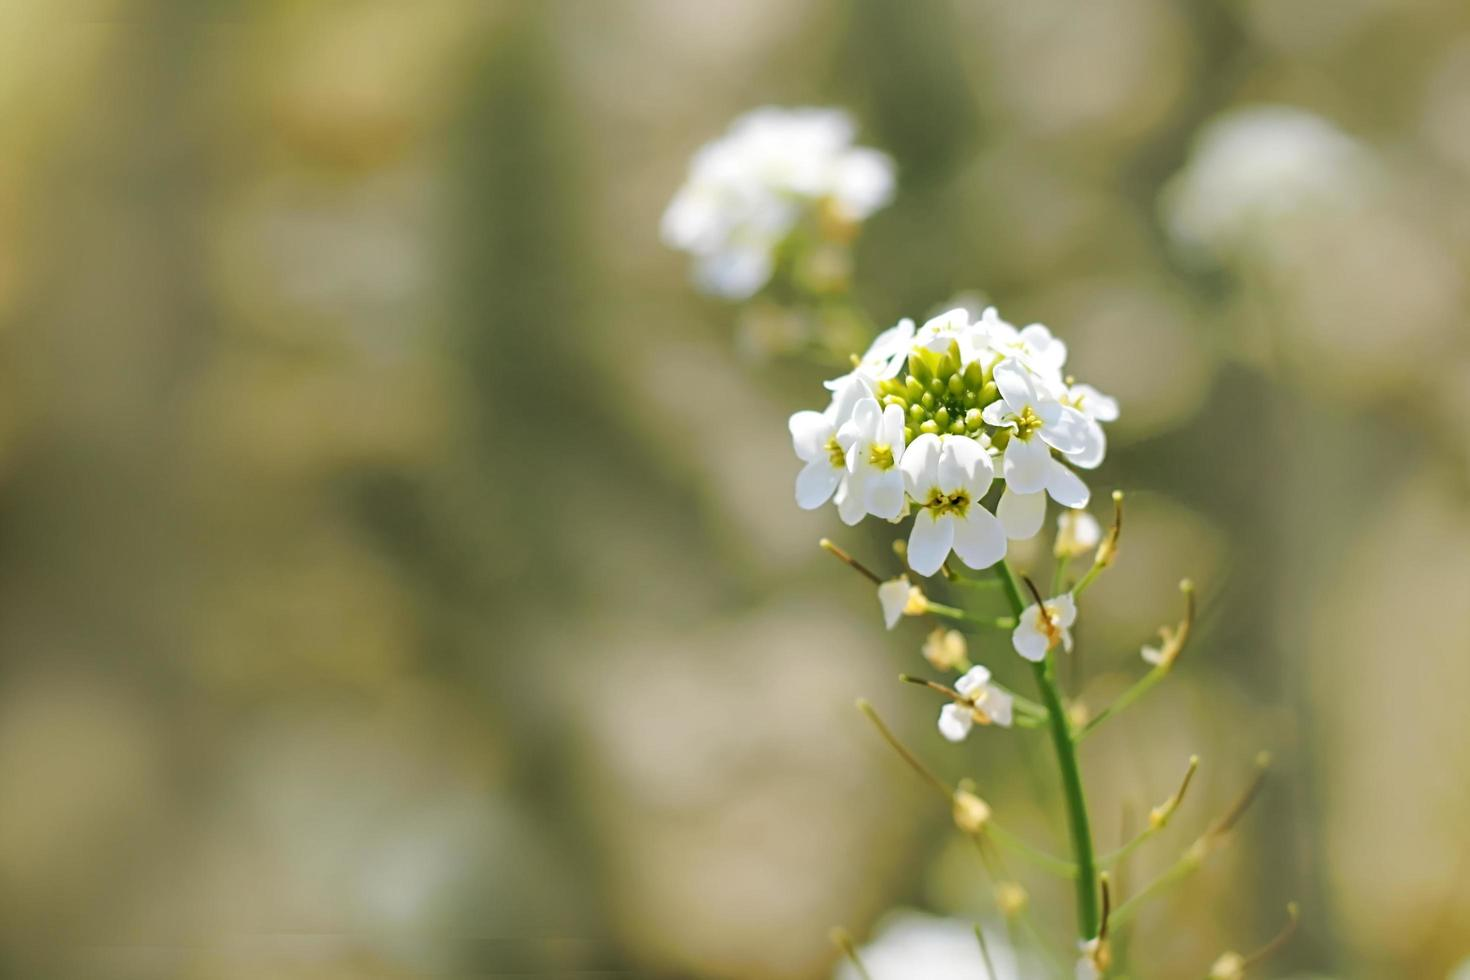 White flowers in field photo